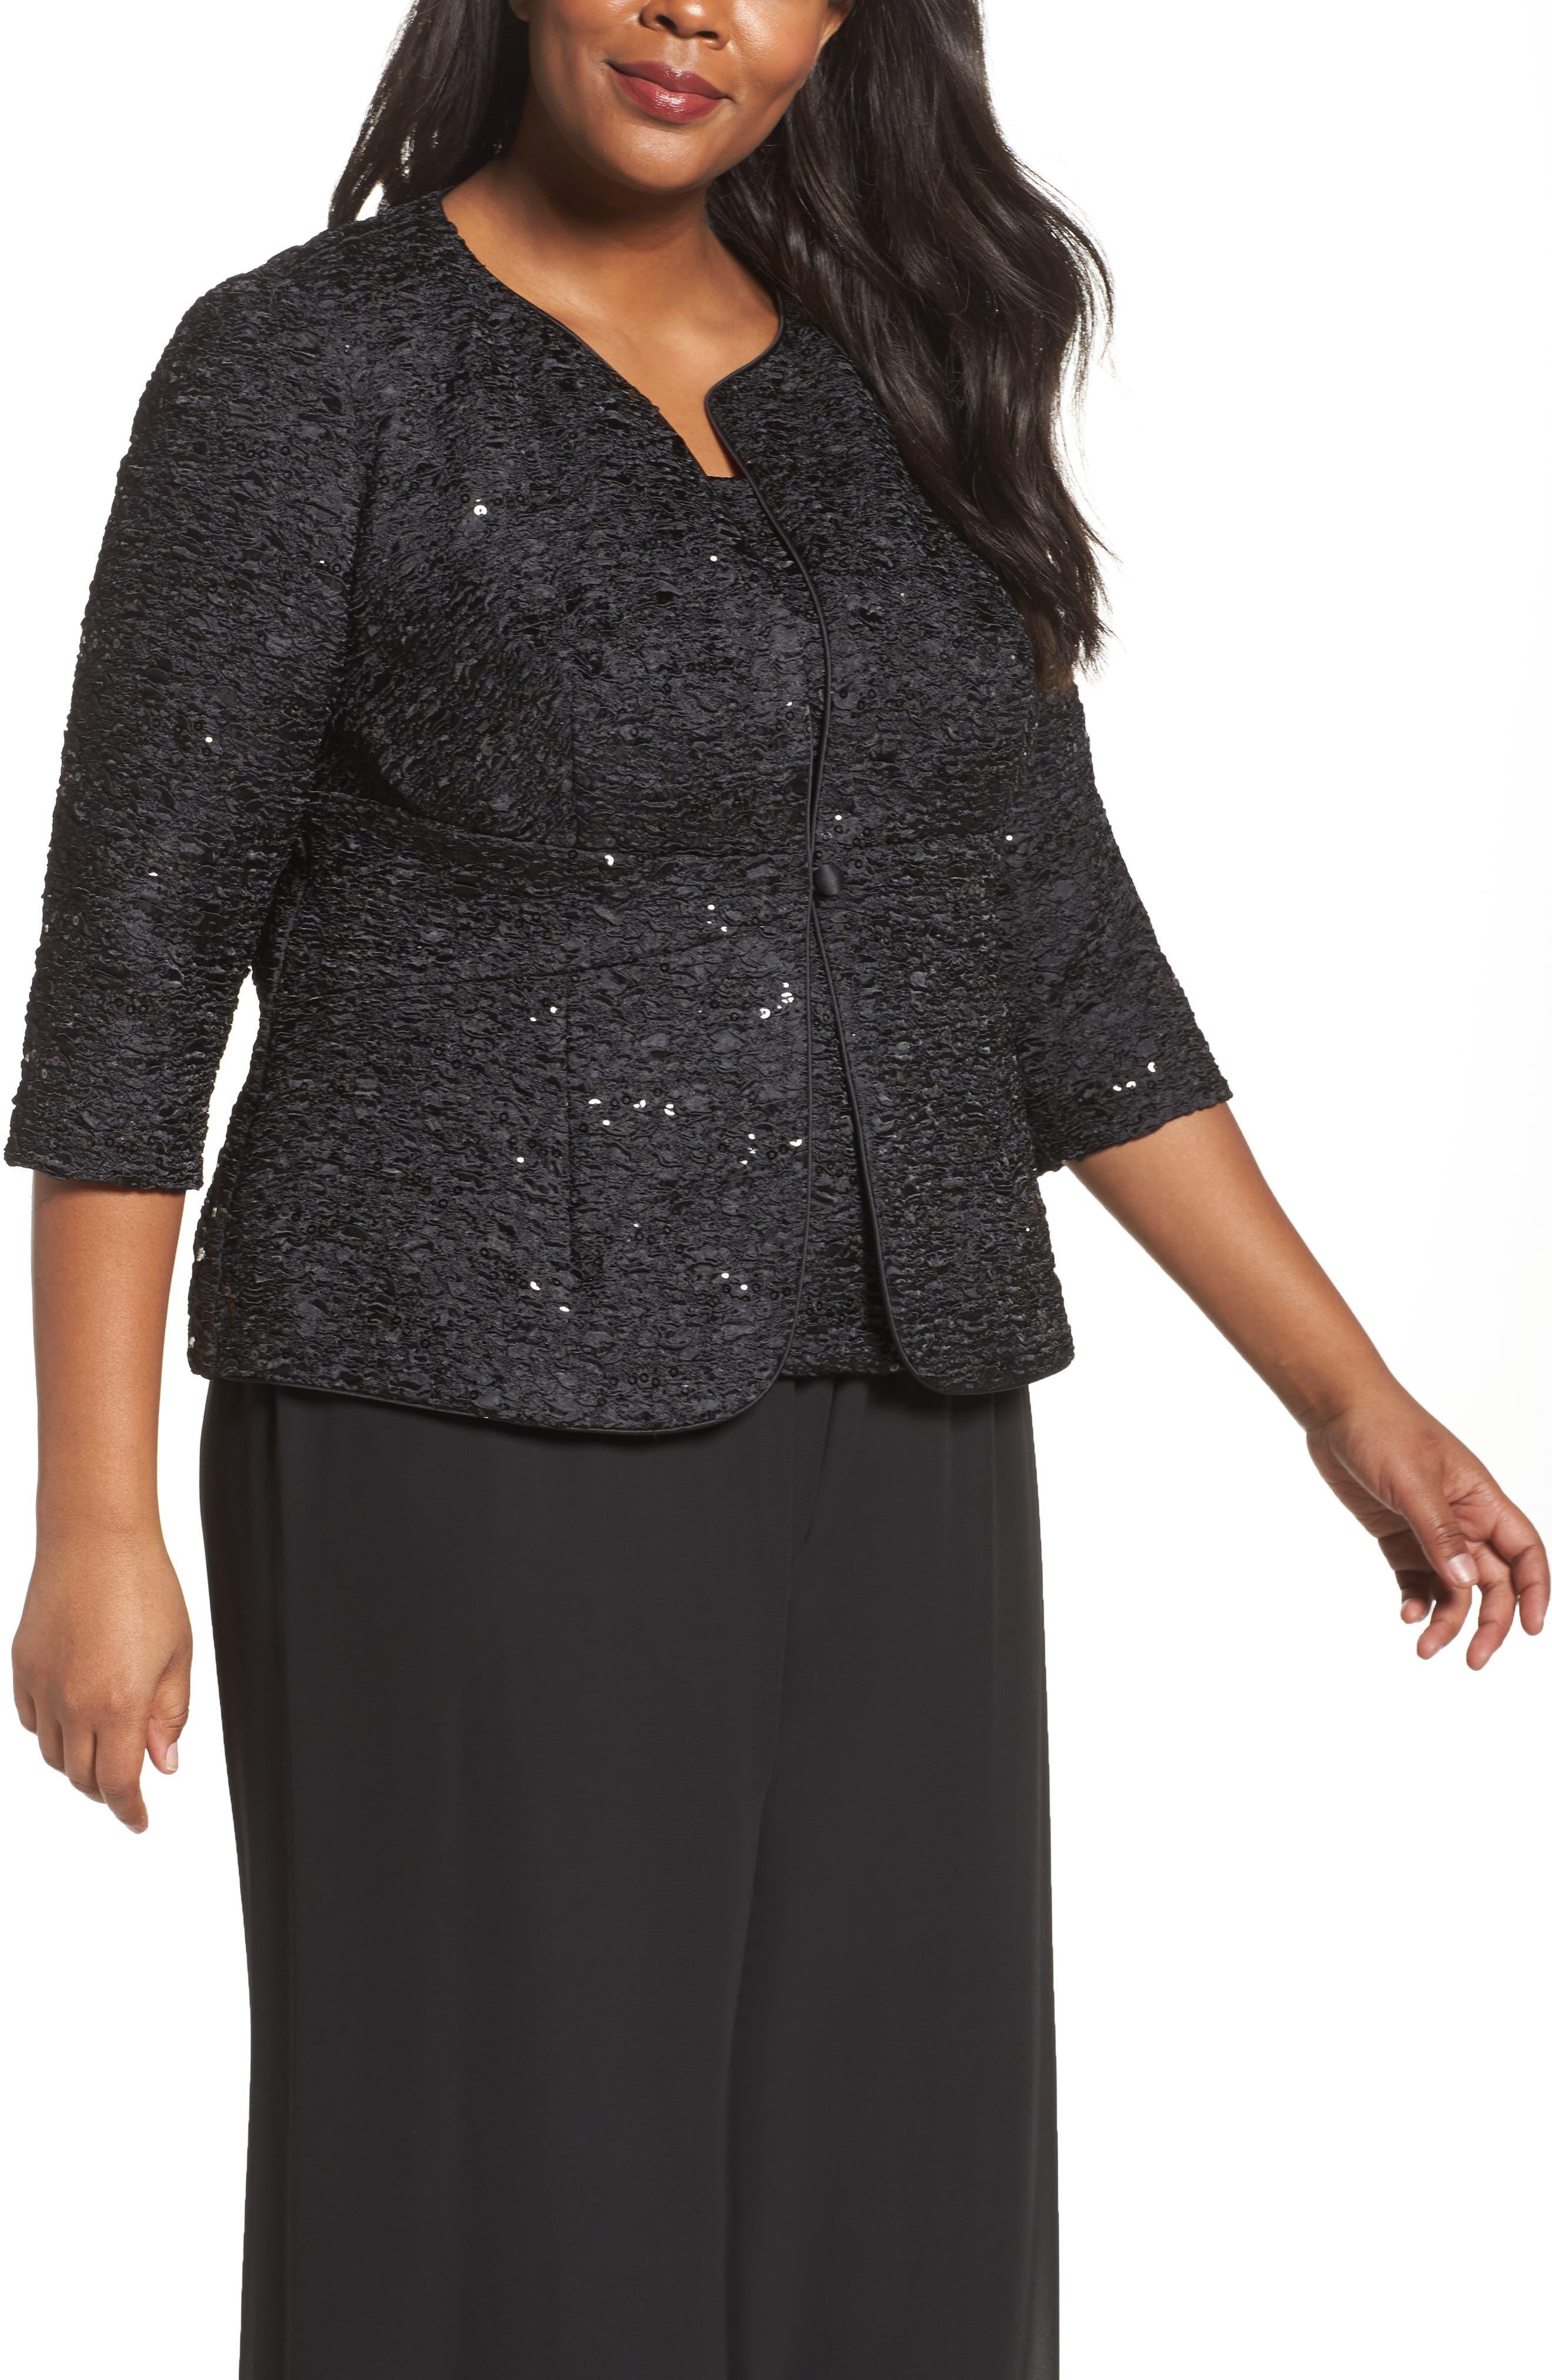 Main Image - Alex Evenings Sequin Jacket & Camisole Twinset (Plus Size)